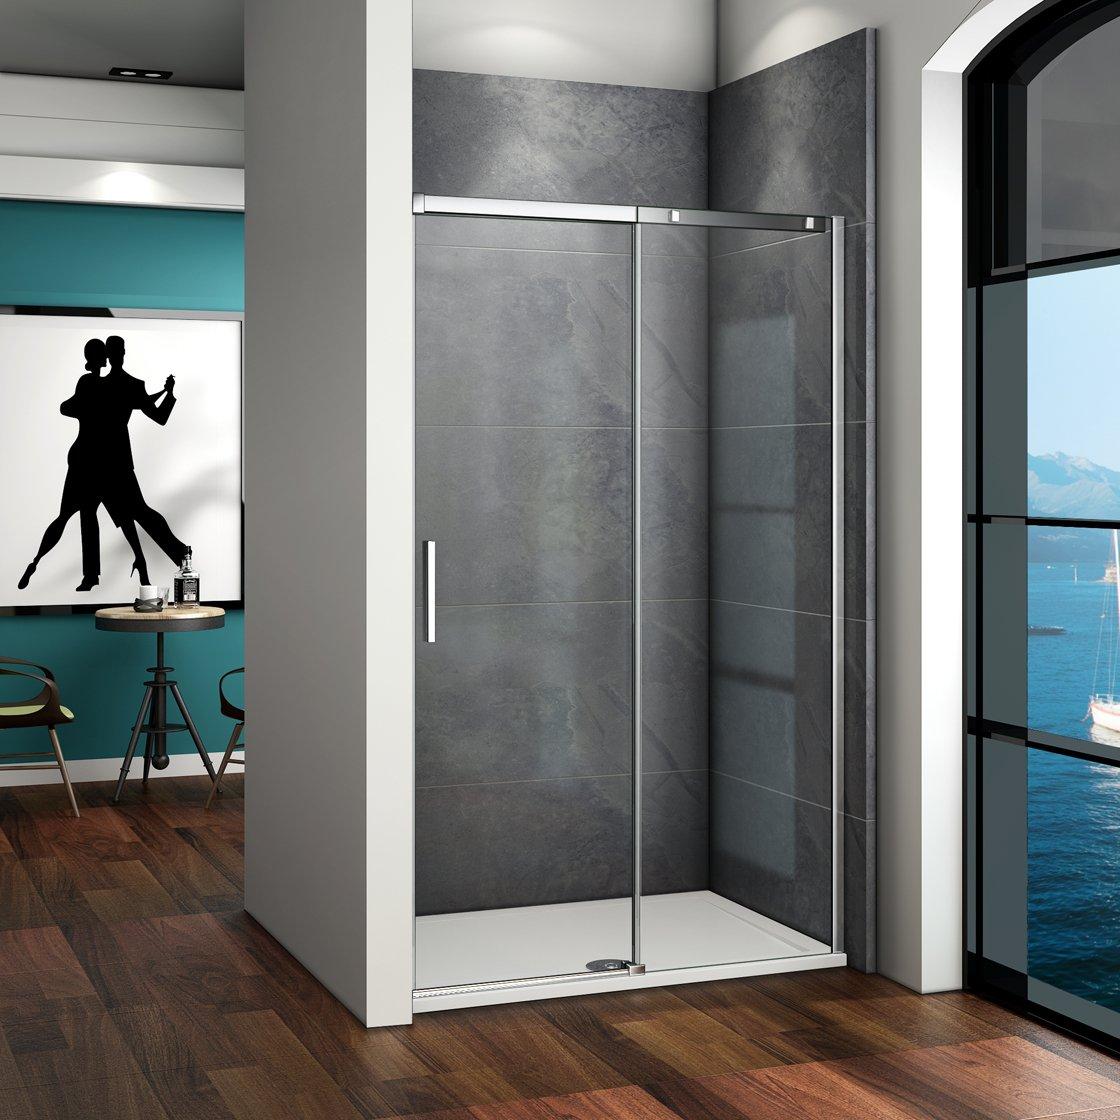 120x70x195cm Mamparas de ducha cabina de ducha 6mm vidrio templado de Aica